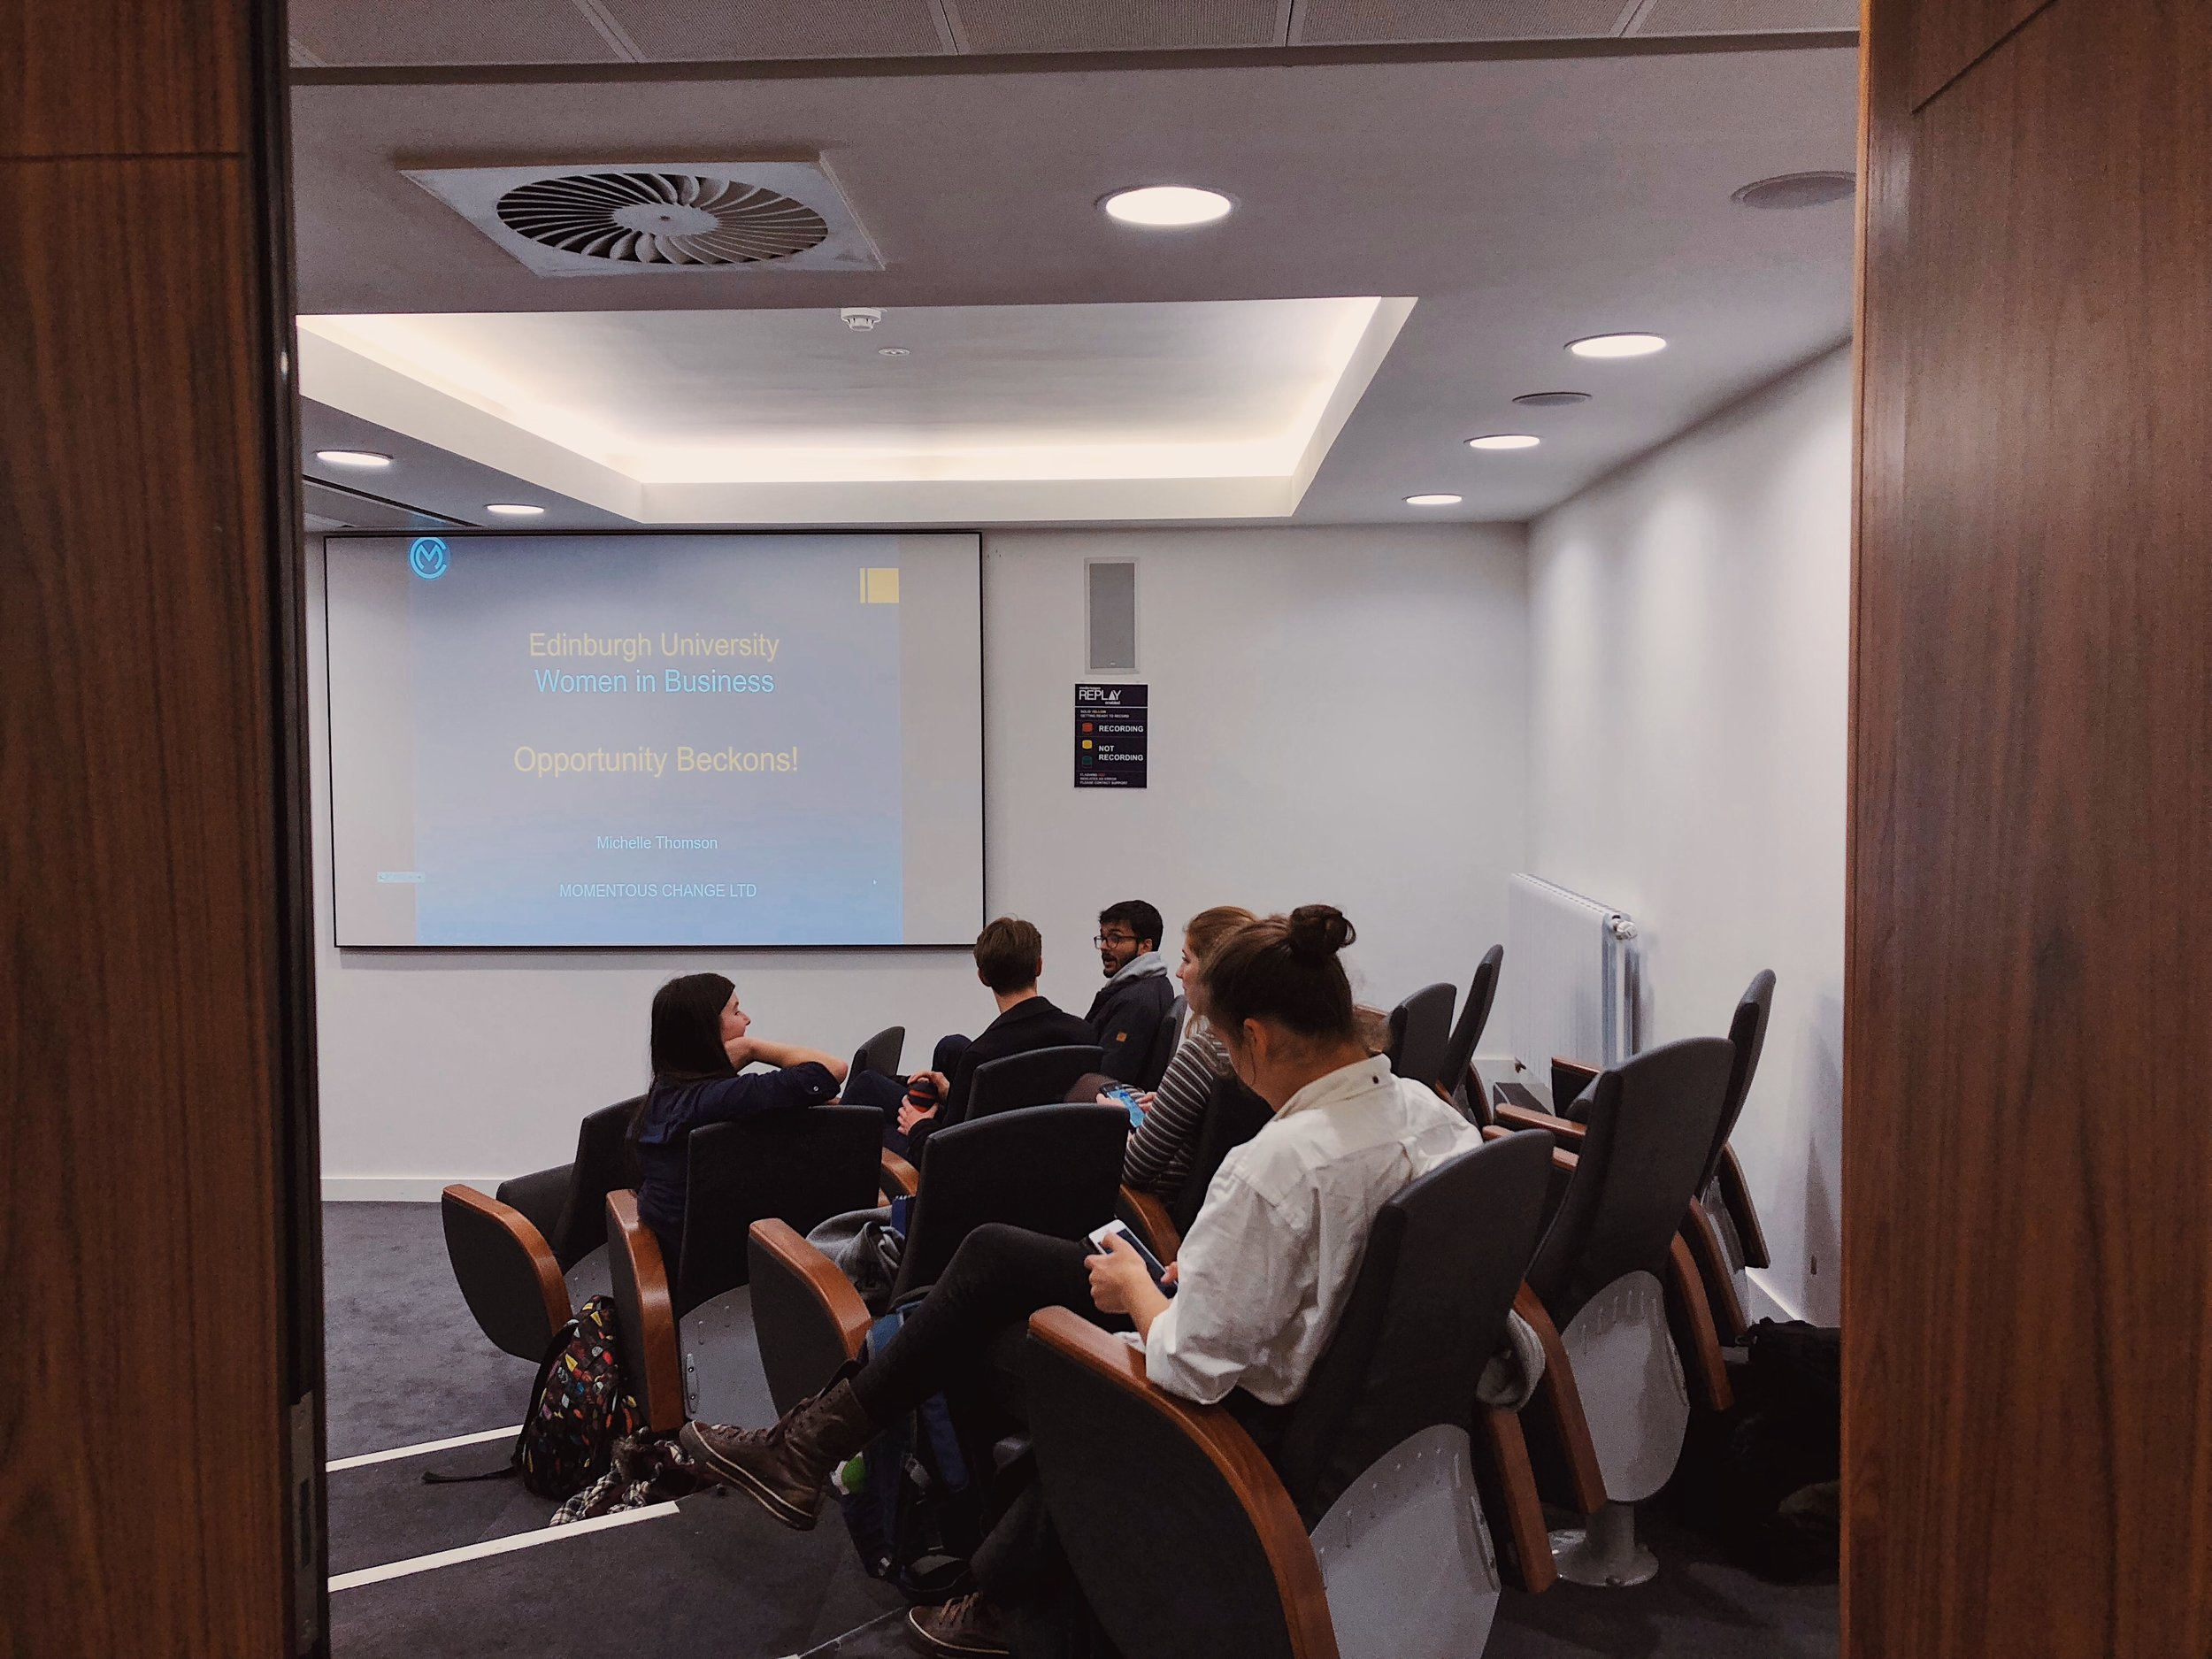 EUWIB Edinburgh University Women in Business event-3.jpg